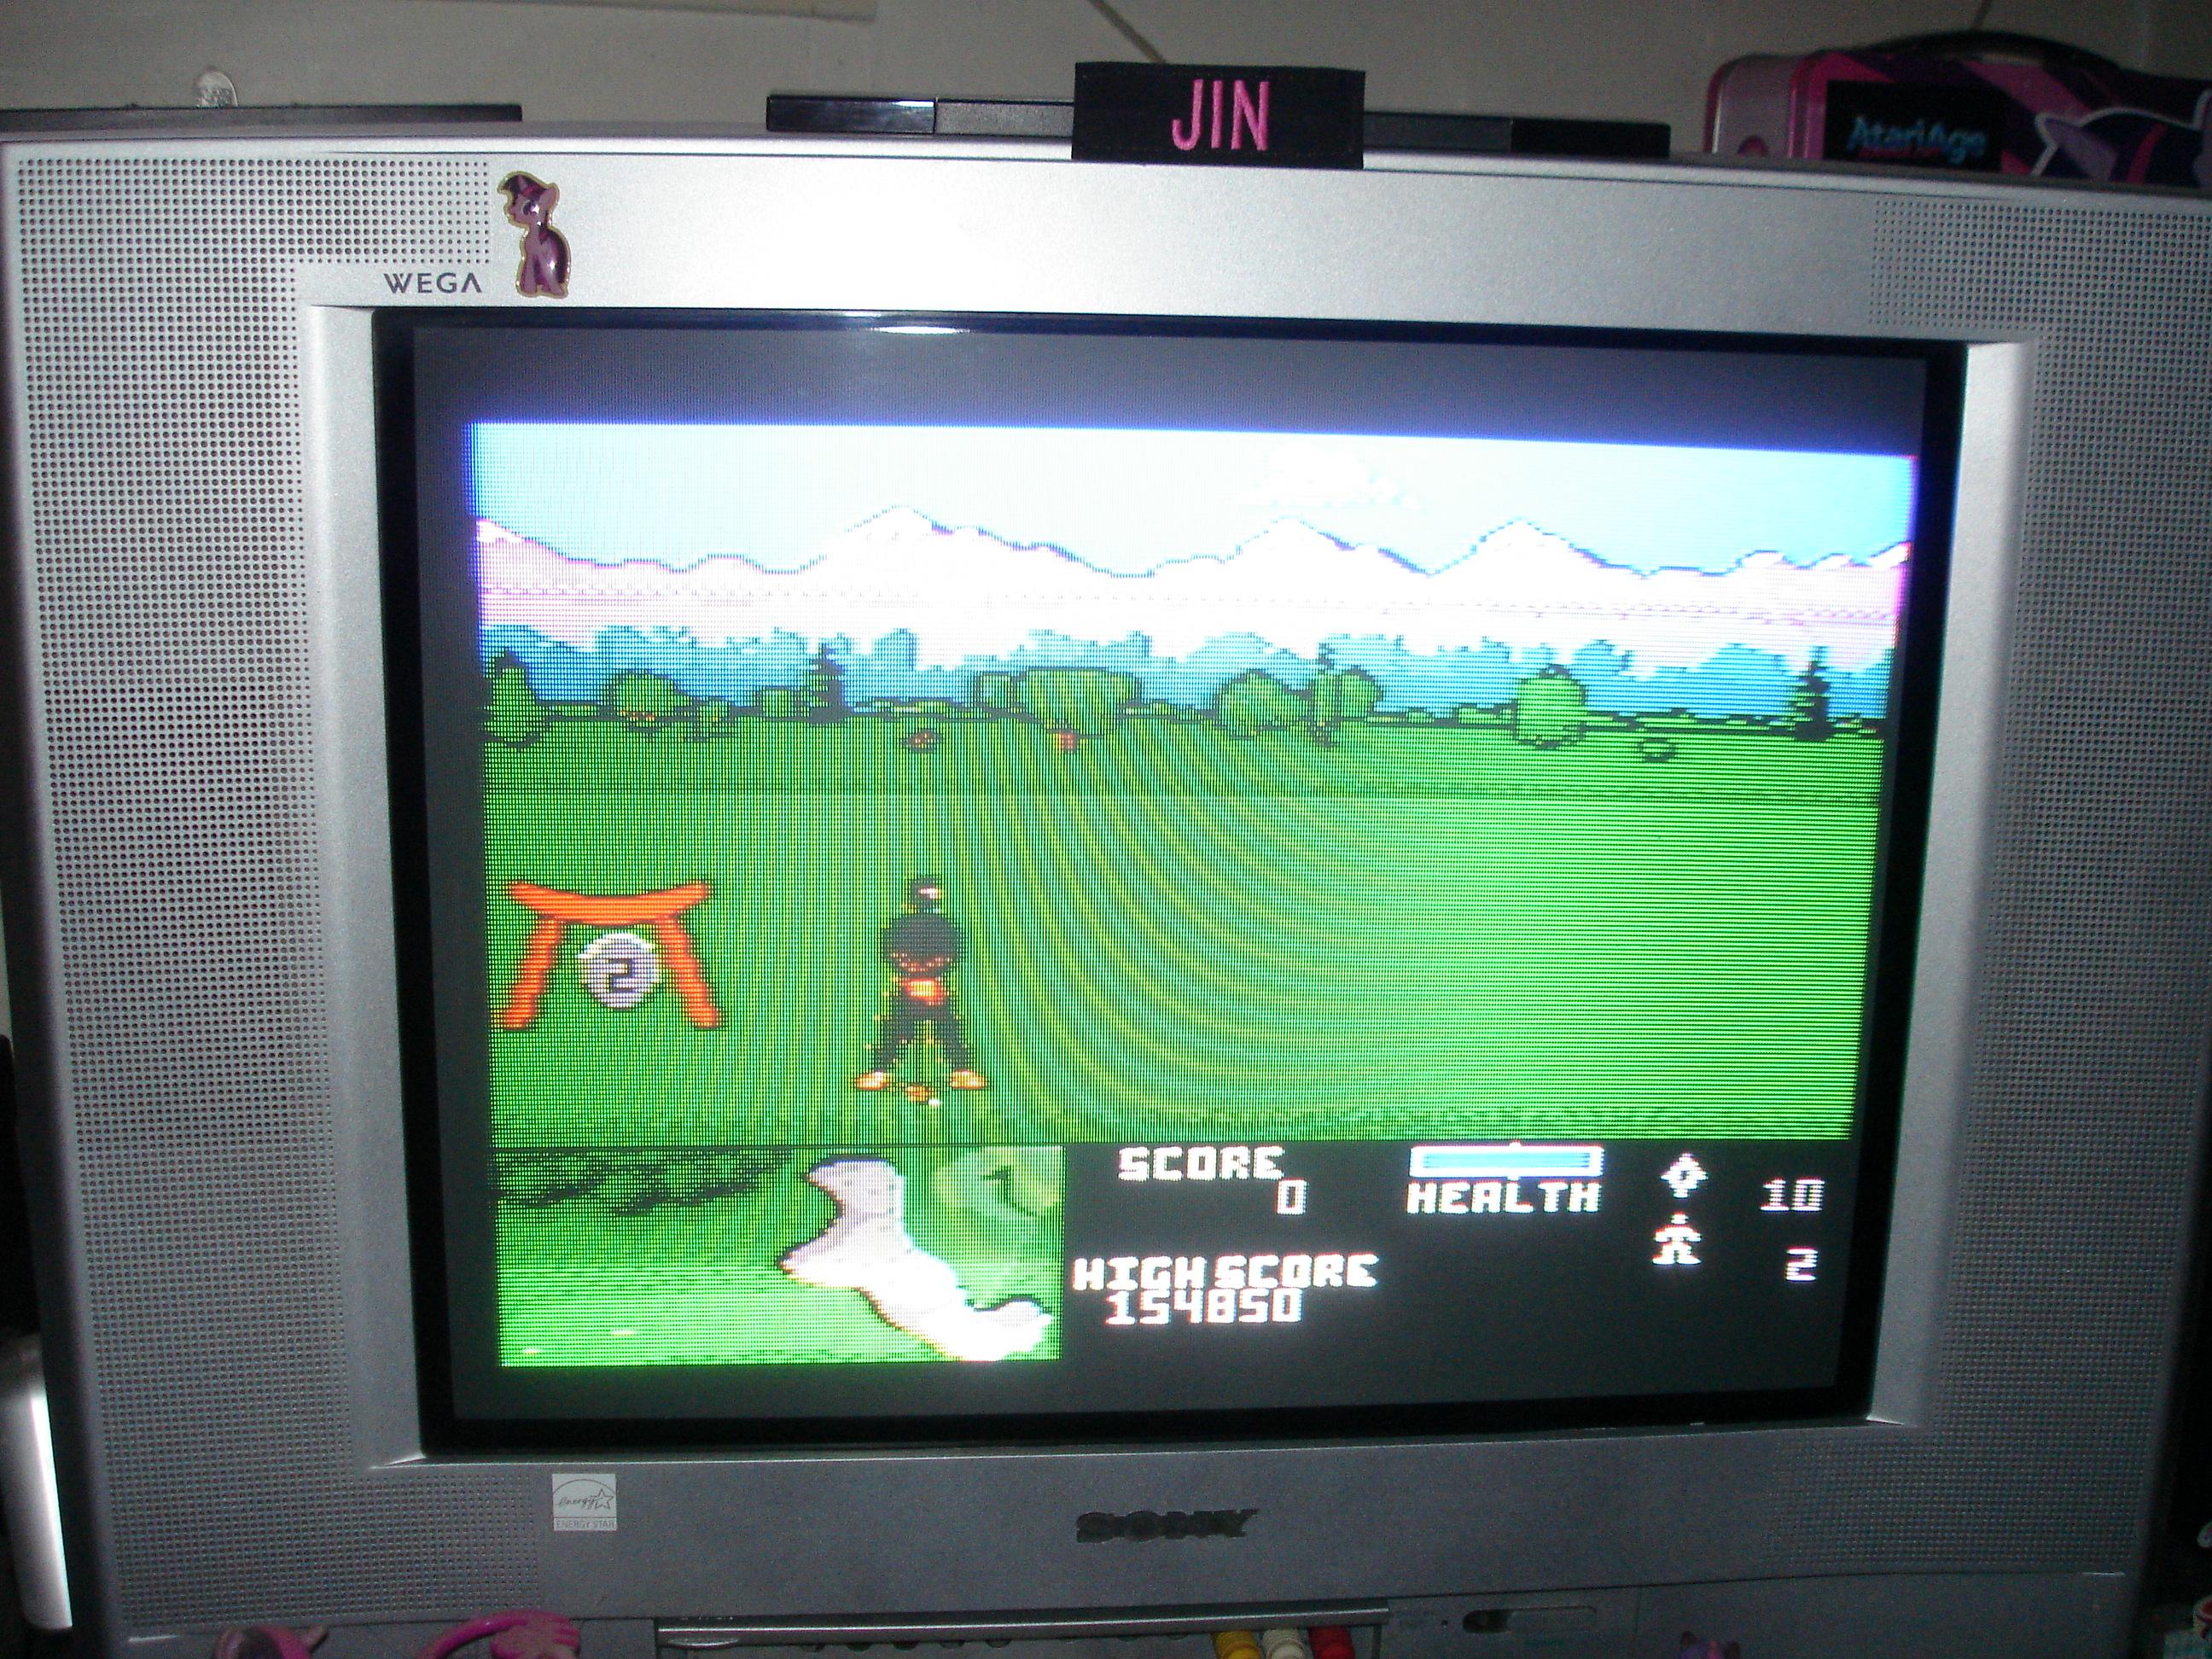 Ninja Golf: Easy 154,850 points